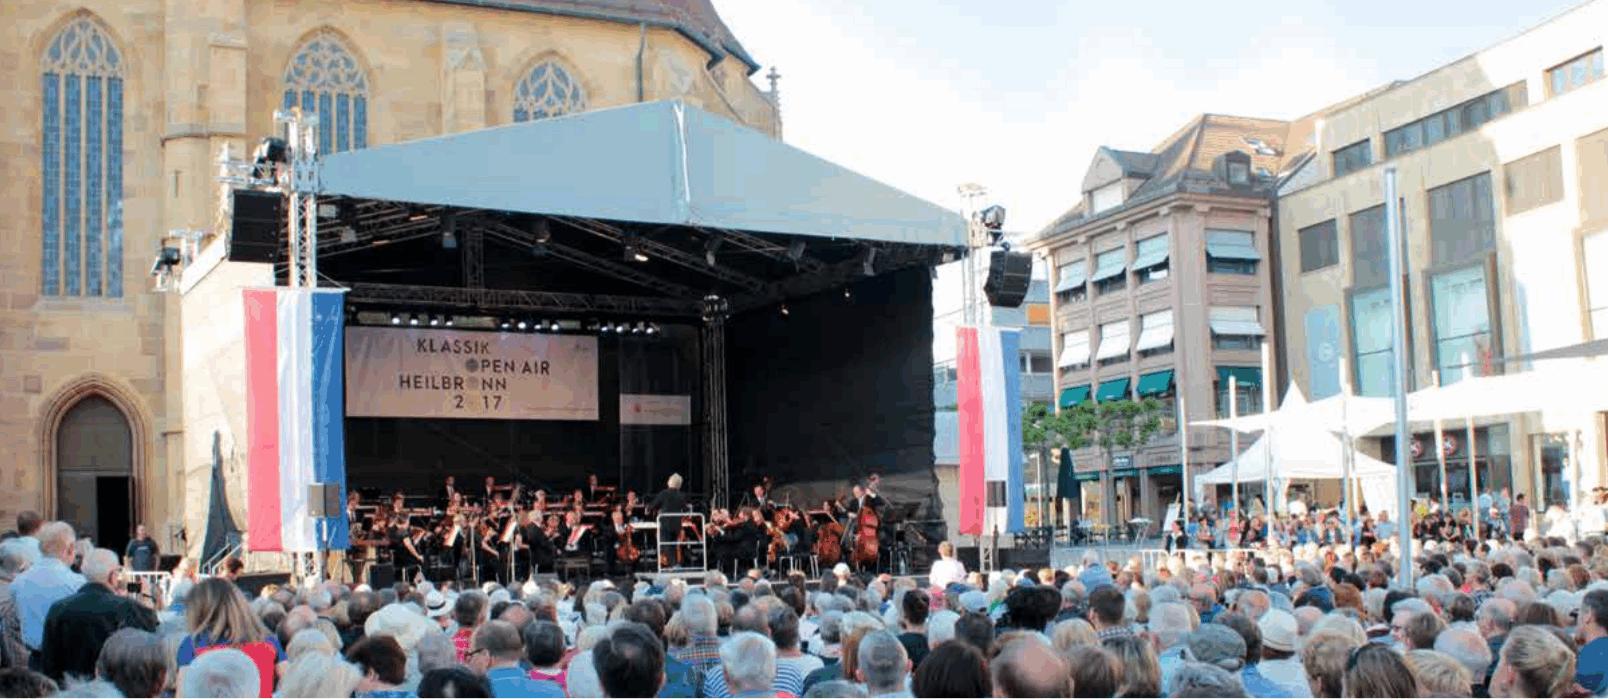 Klassik-Open-Air Heilbronn